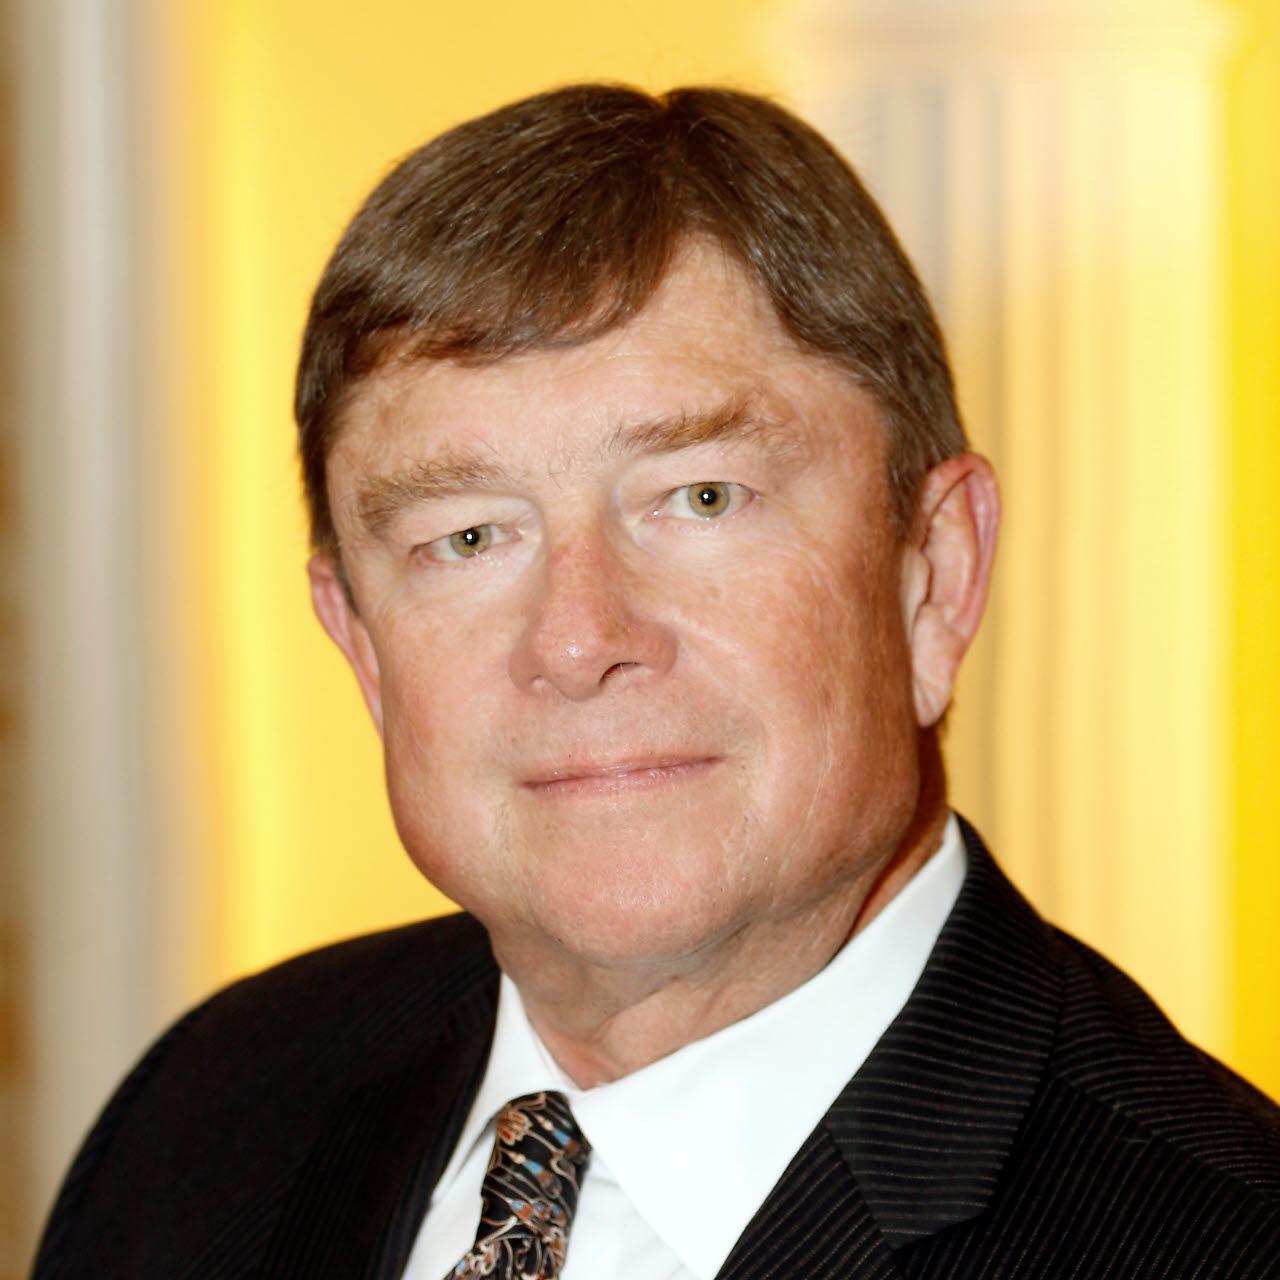 Clive Thurston